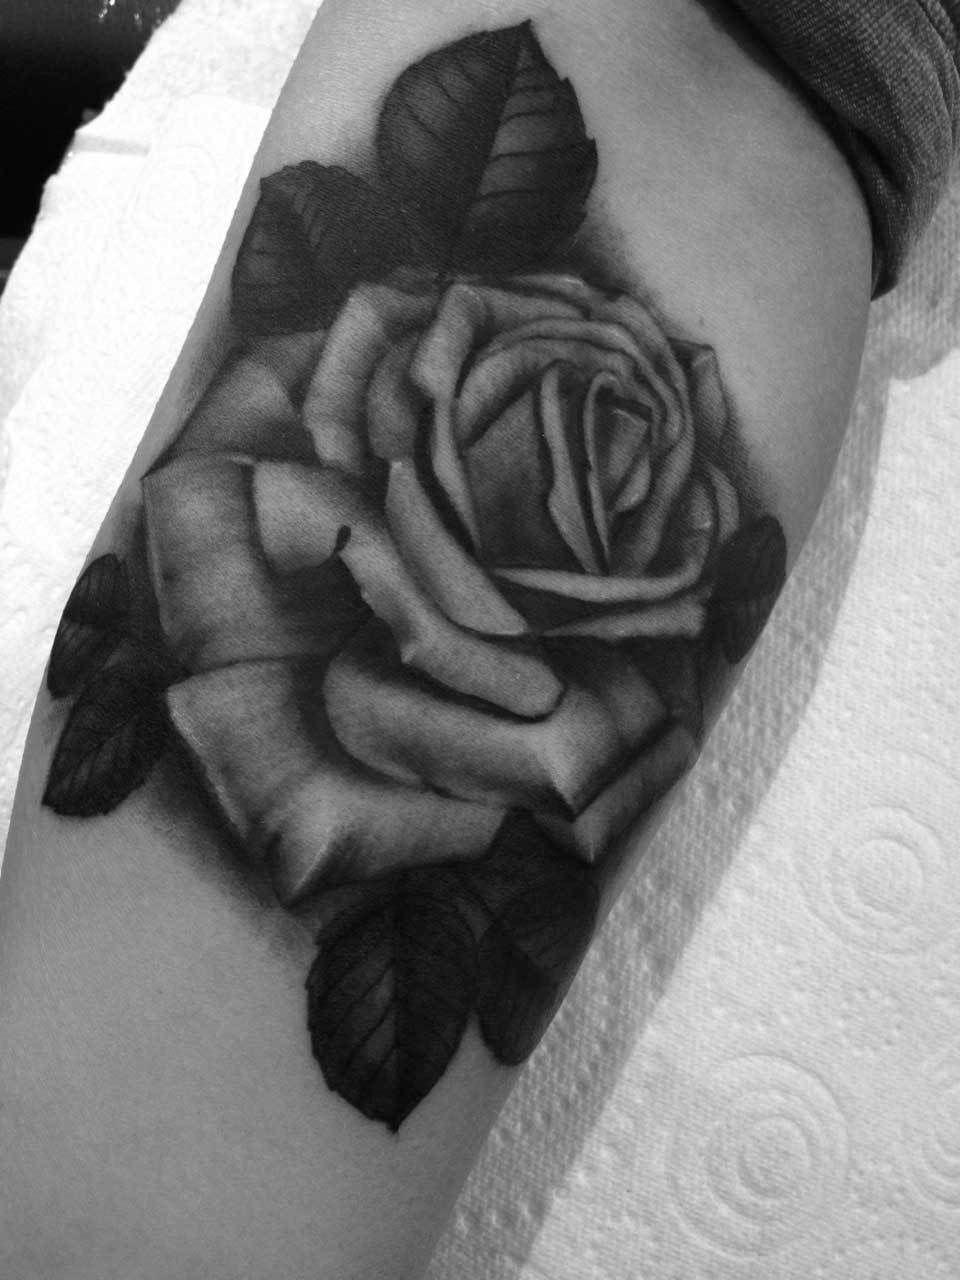 Rose-leaves-tattoo-forearm-rosemary-mckevitt-tattoo-ireland